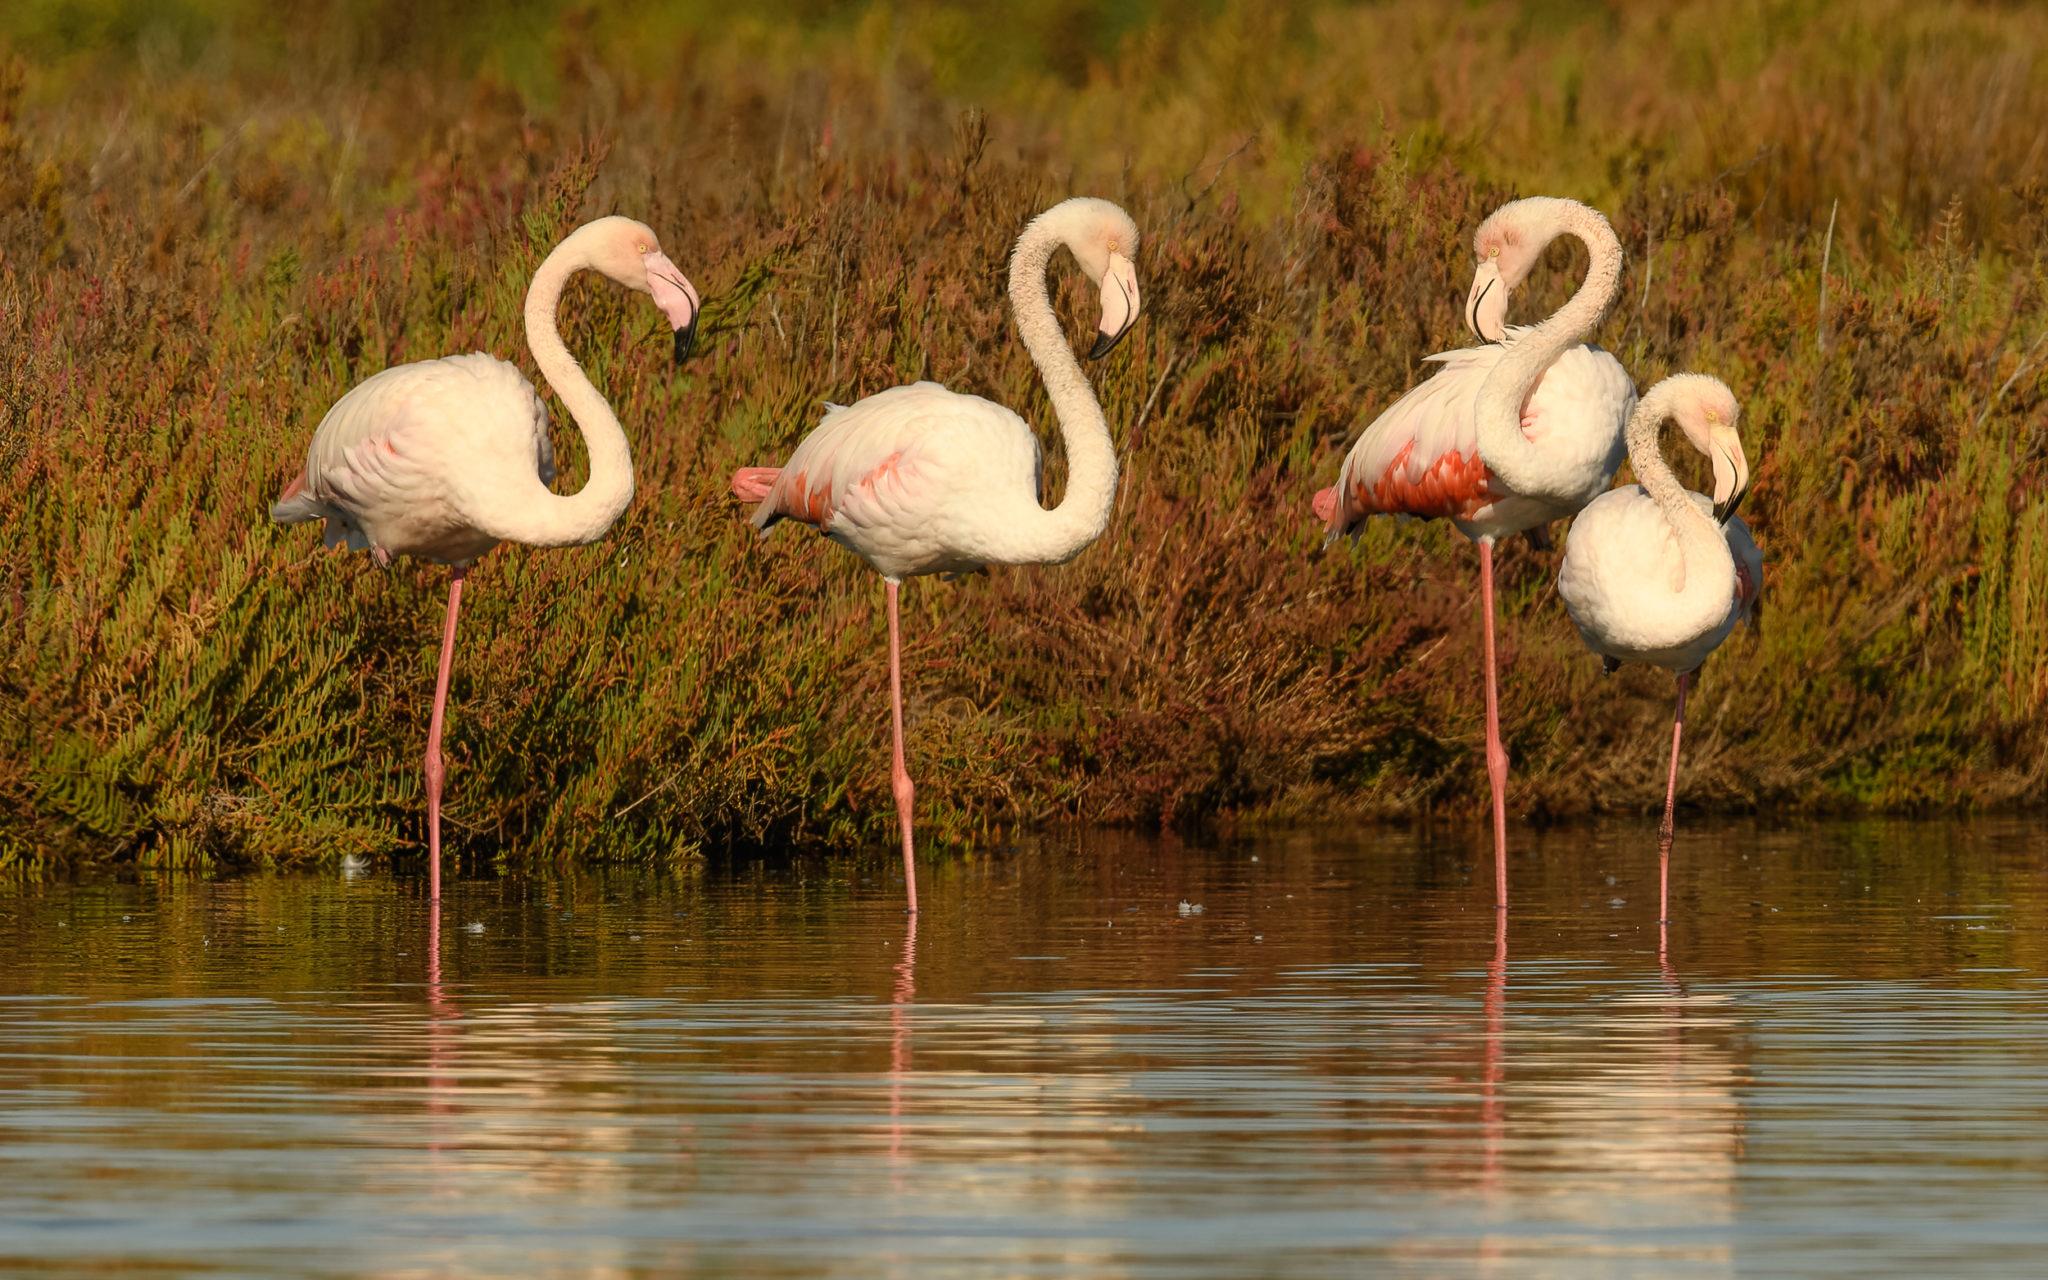 Flamingos (Phoenicopteridae), Portugal, Algarbe, Naturfotografie Sylvia & Olaf Rentzsch